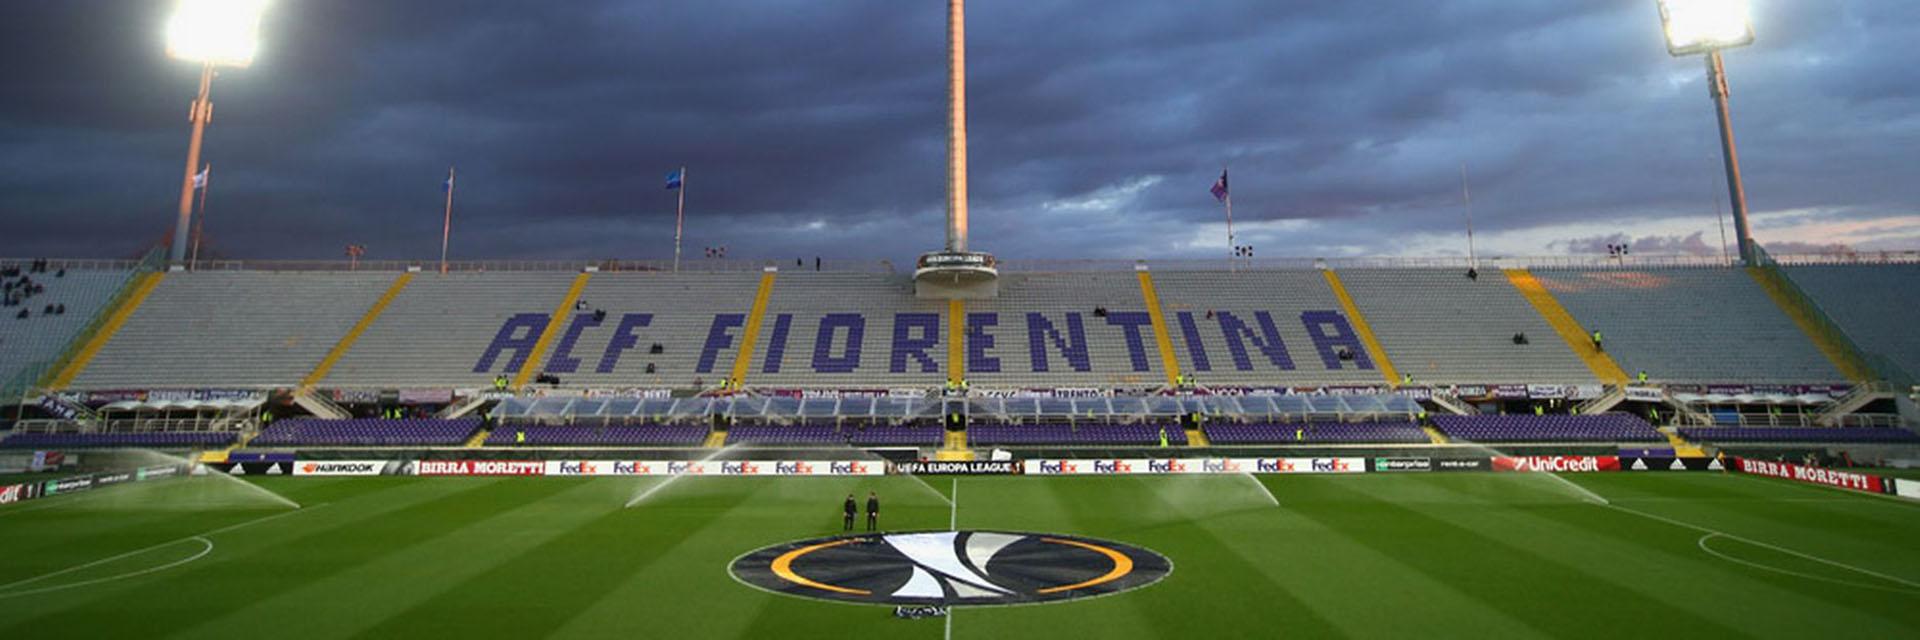 ACF Fiorentina - Inter Milan, 0 decemberkl. 20:45